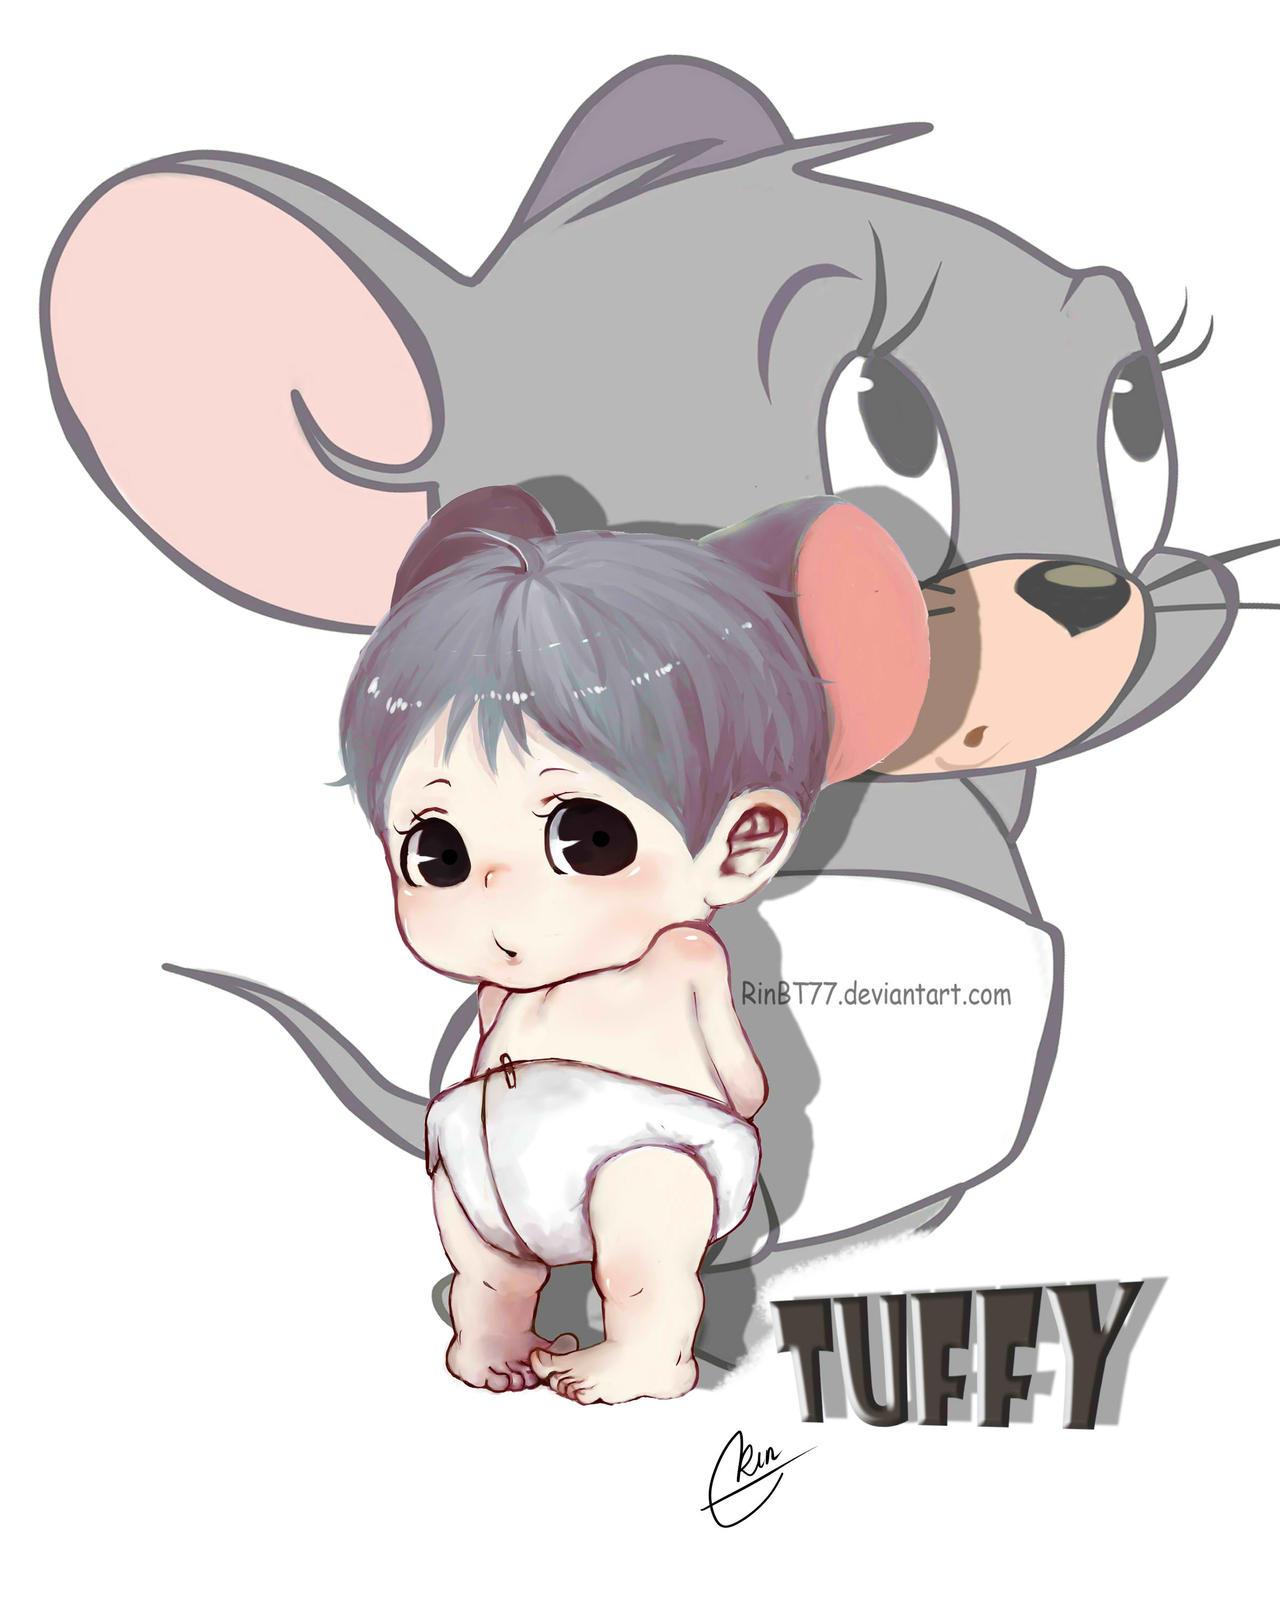 Tuffymouse